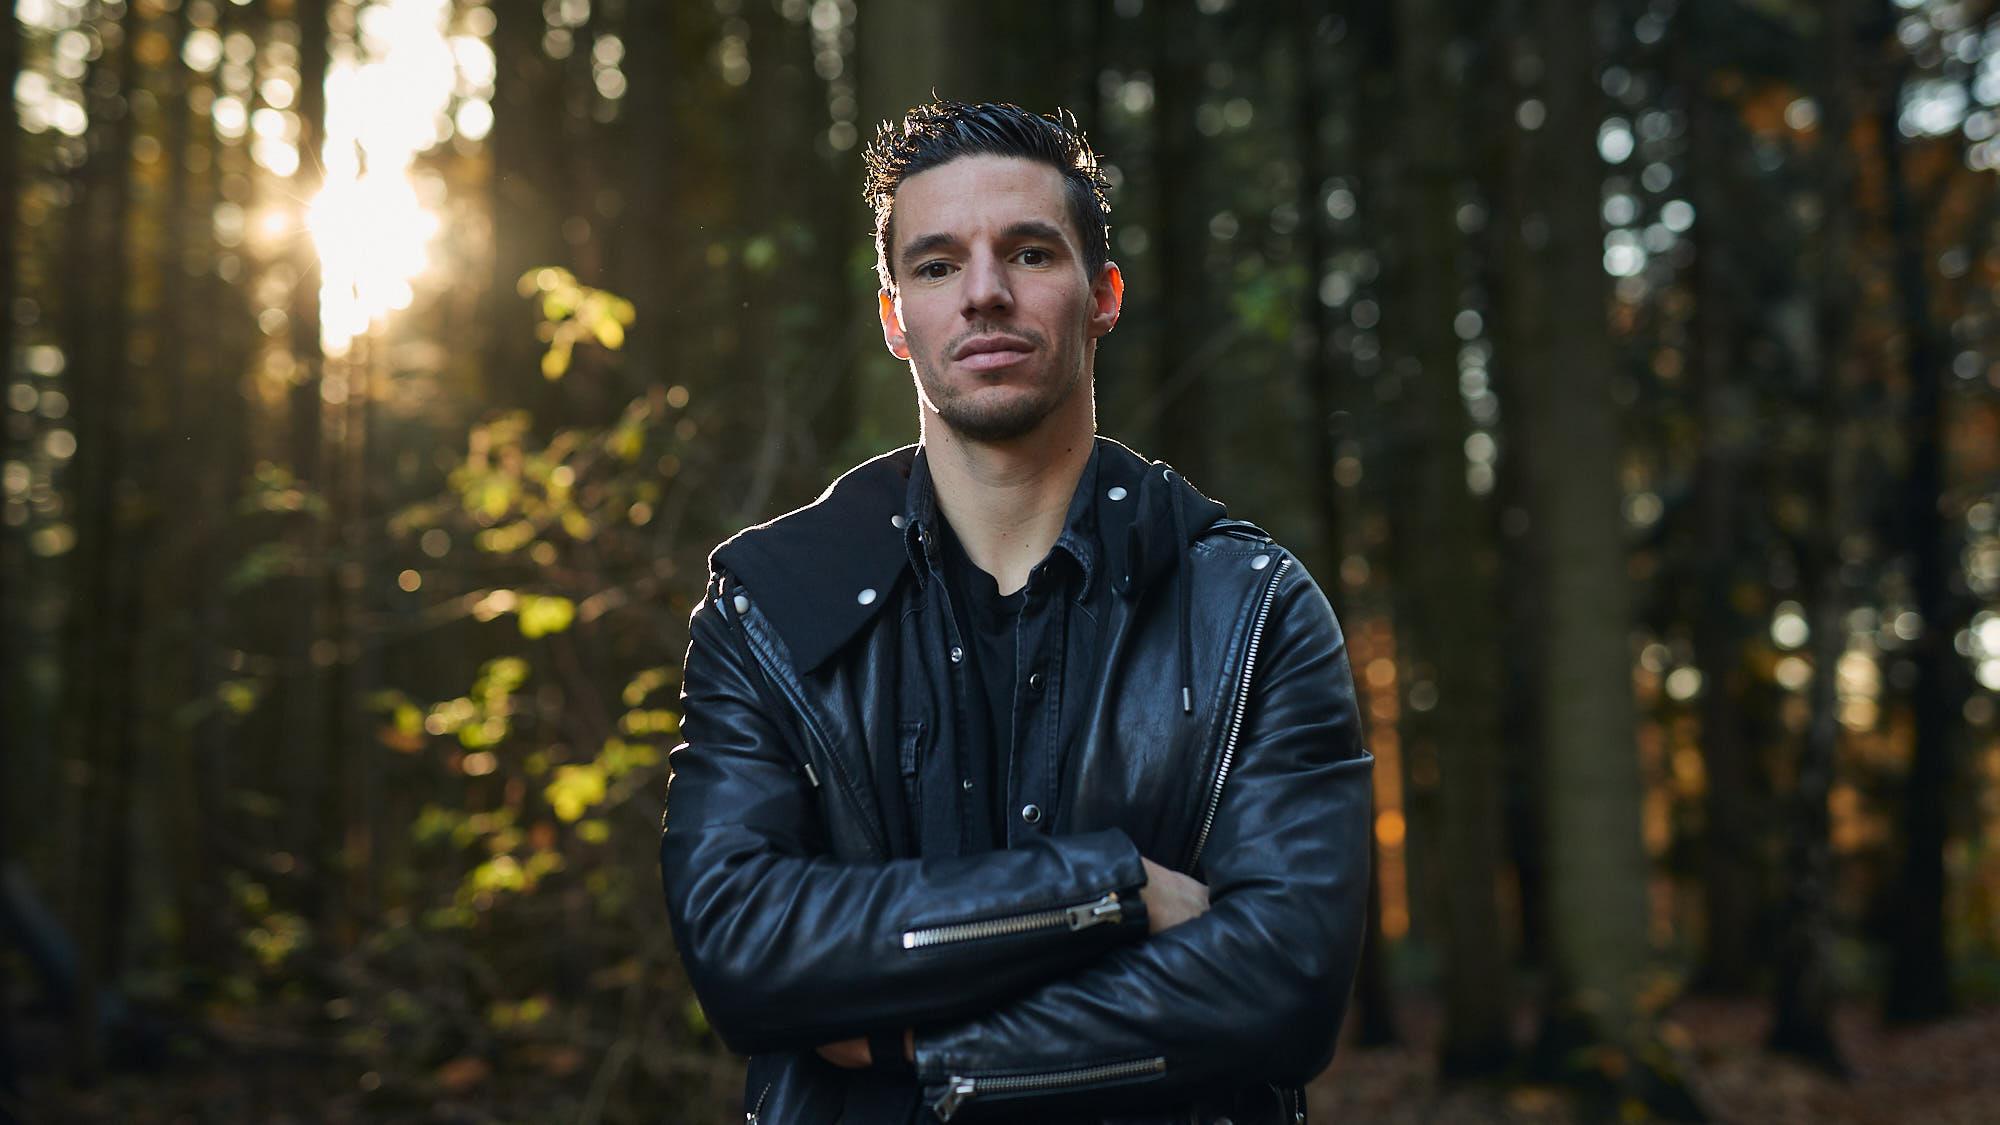 Portrait of PSV Eindhoven defender Nick Viergever